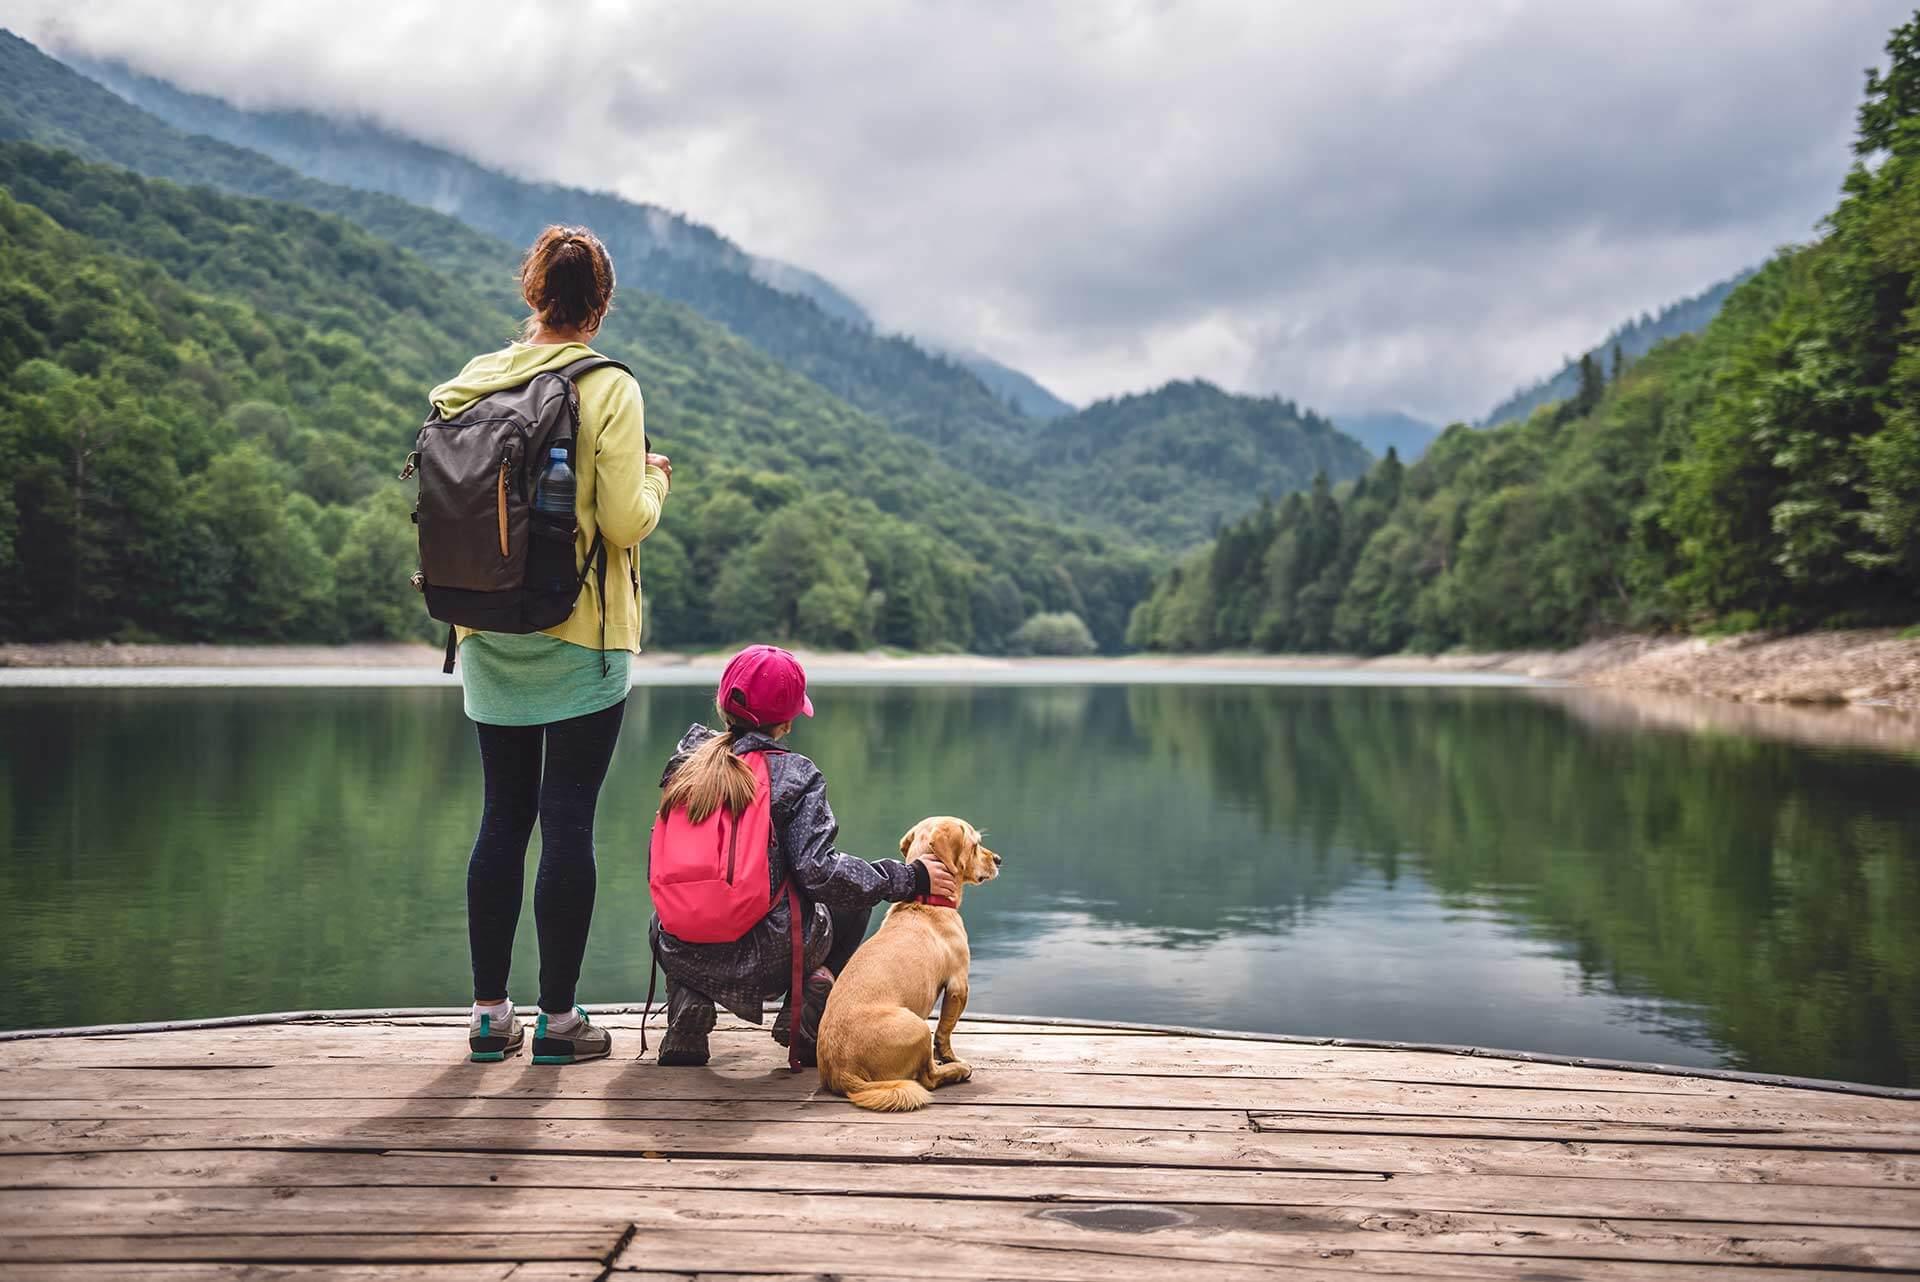 Hundeglück - ein aktivieres Leben dank Hund